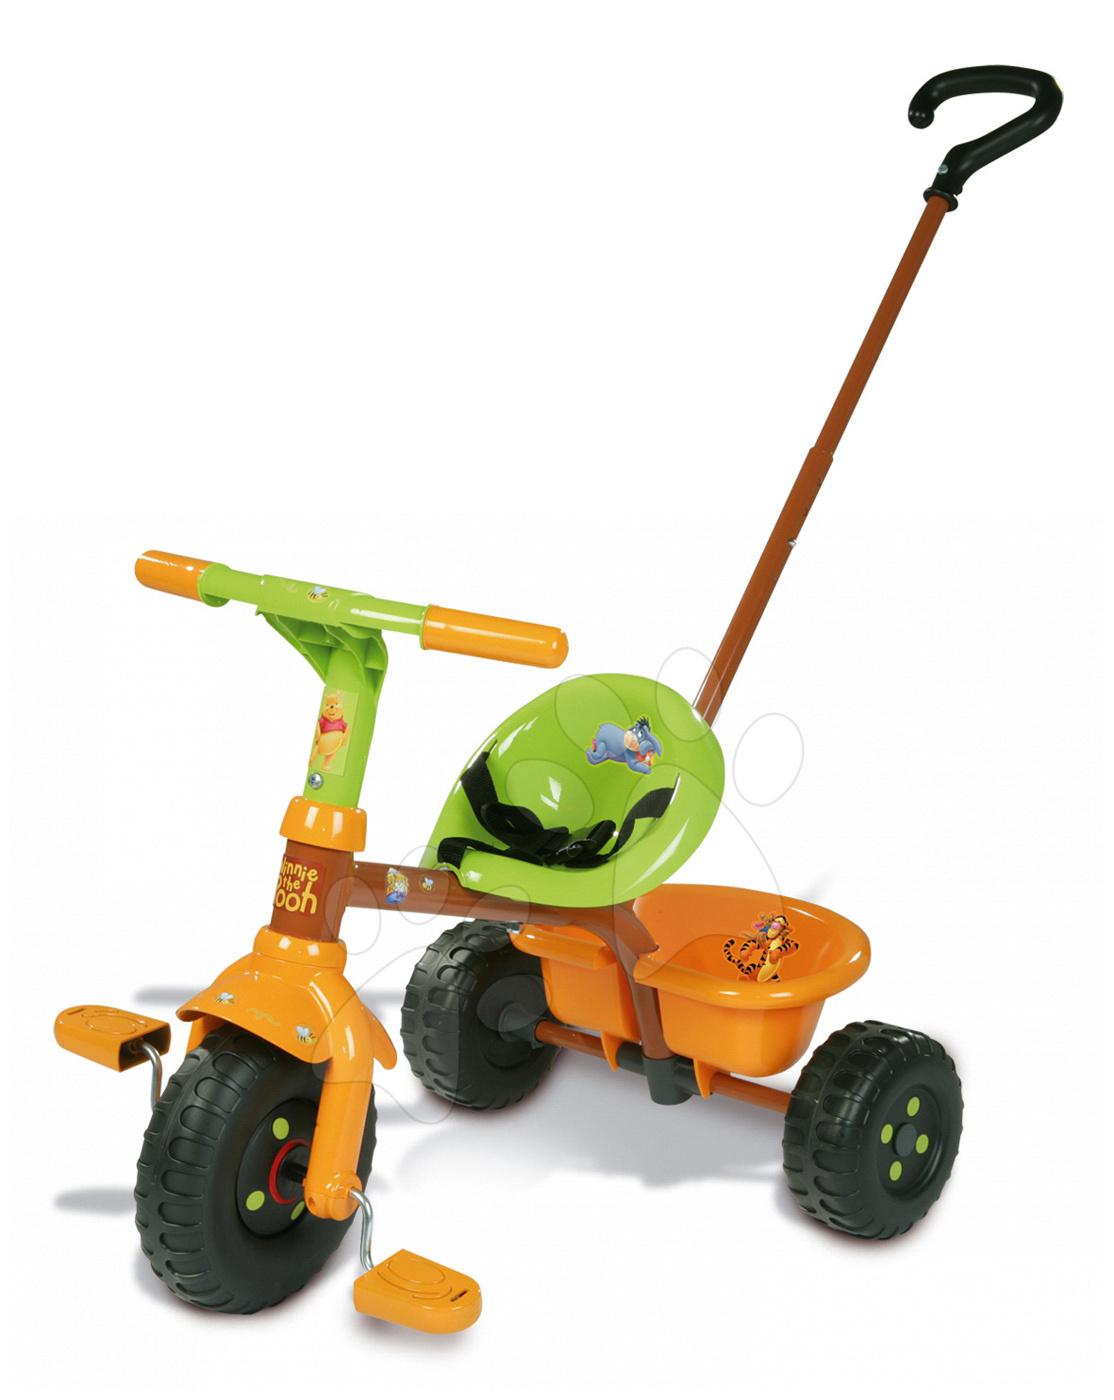 Tricikel Medvedek Pu WD Smoby oranžno-zelen od 15 mes